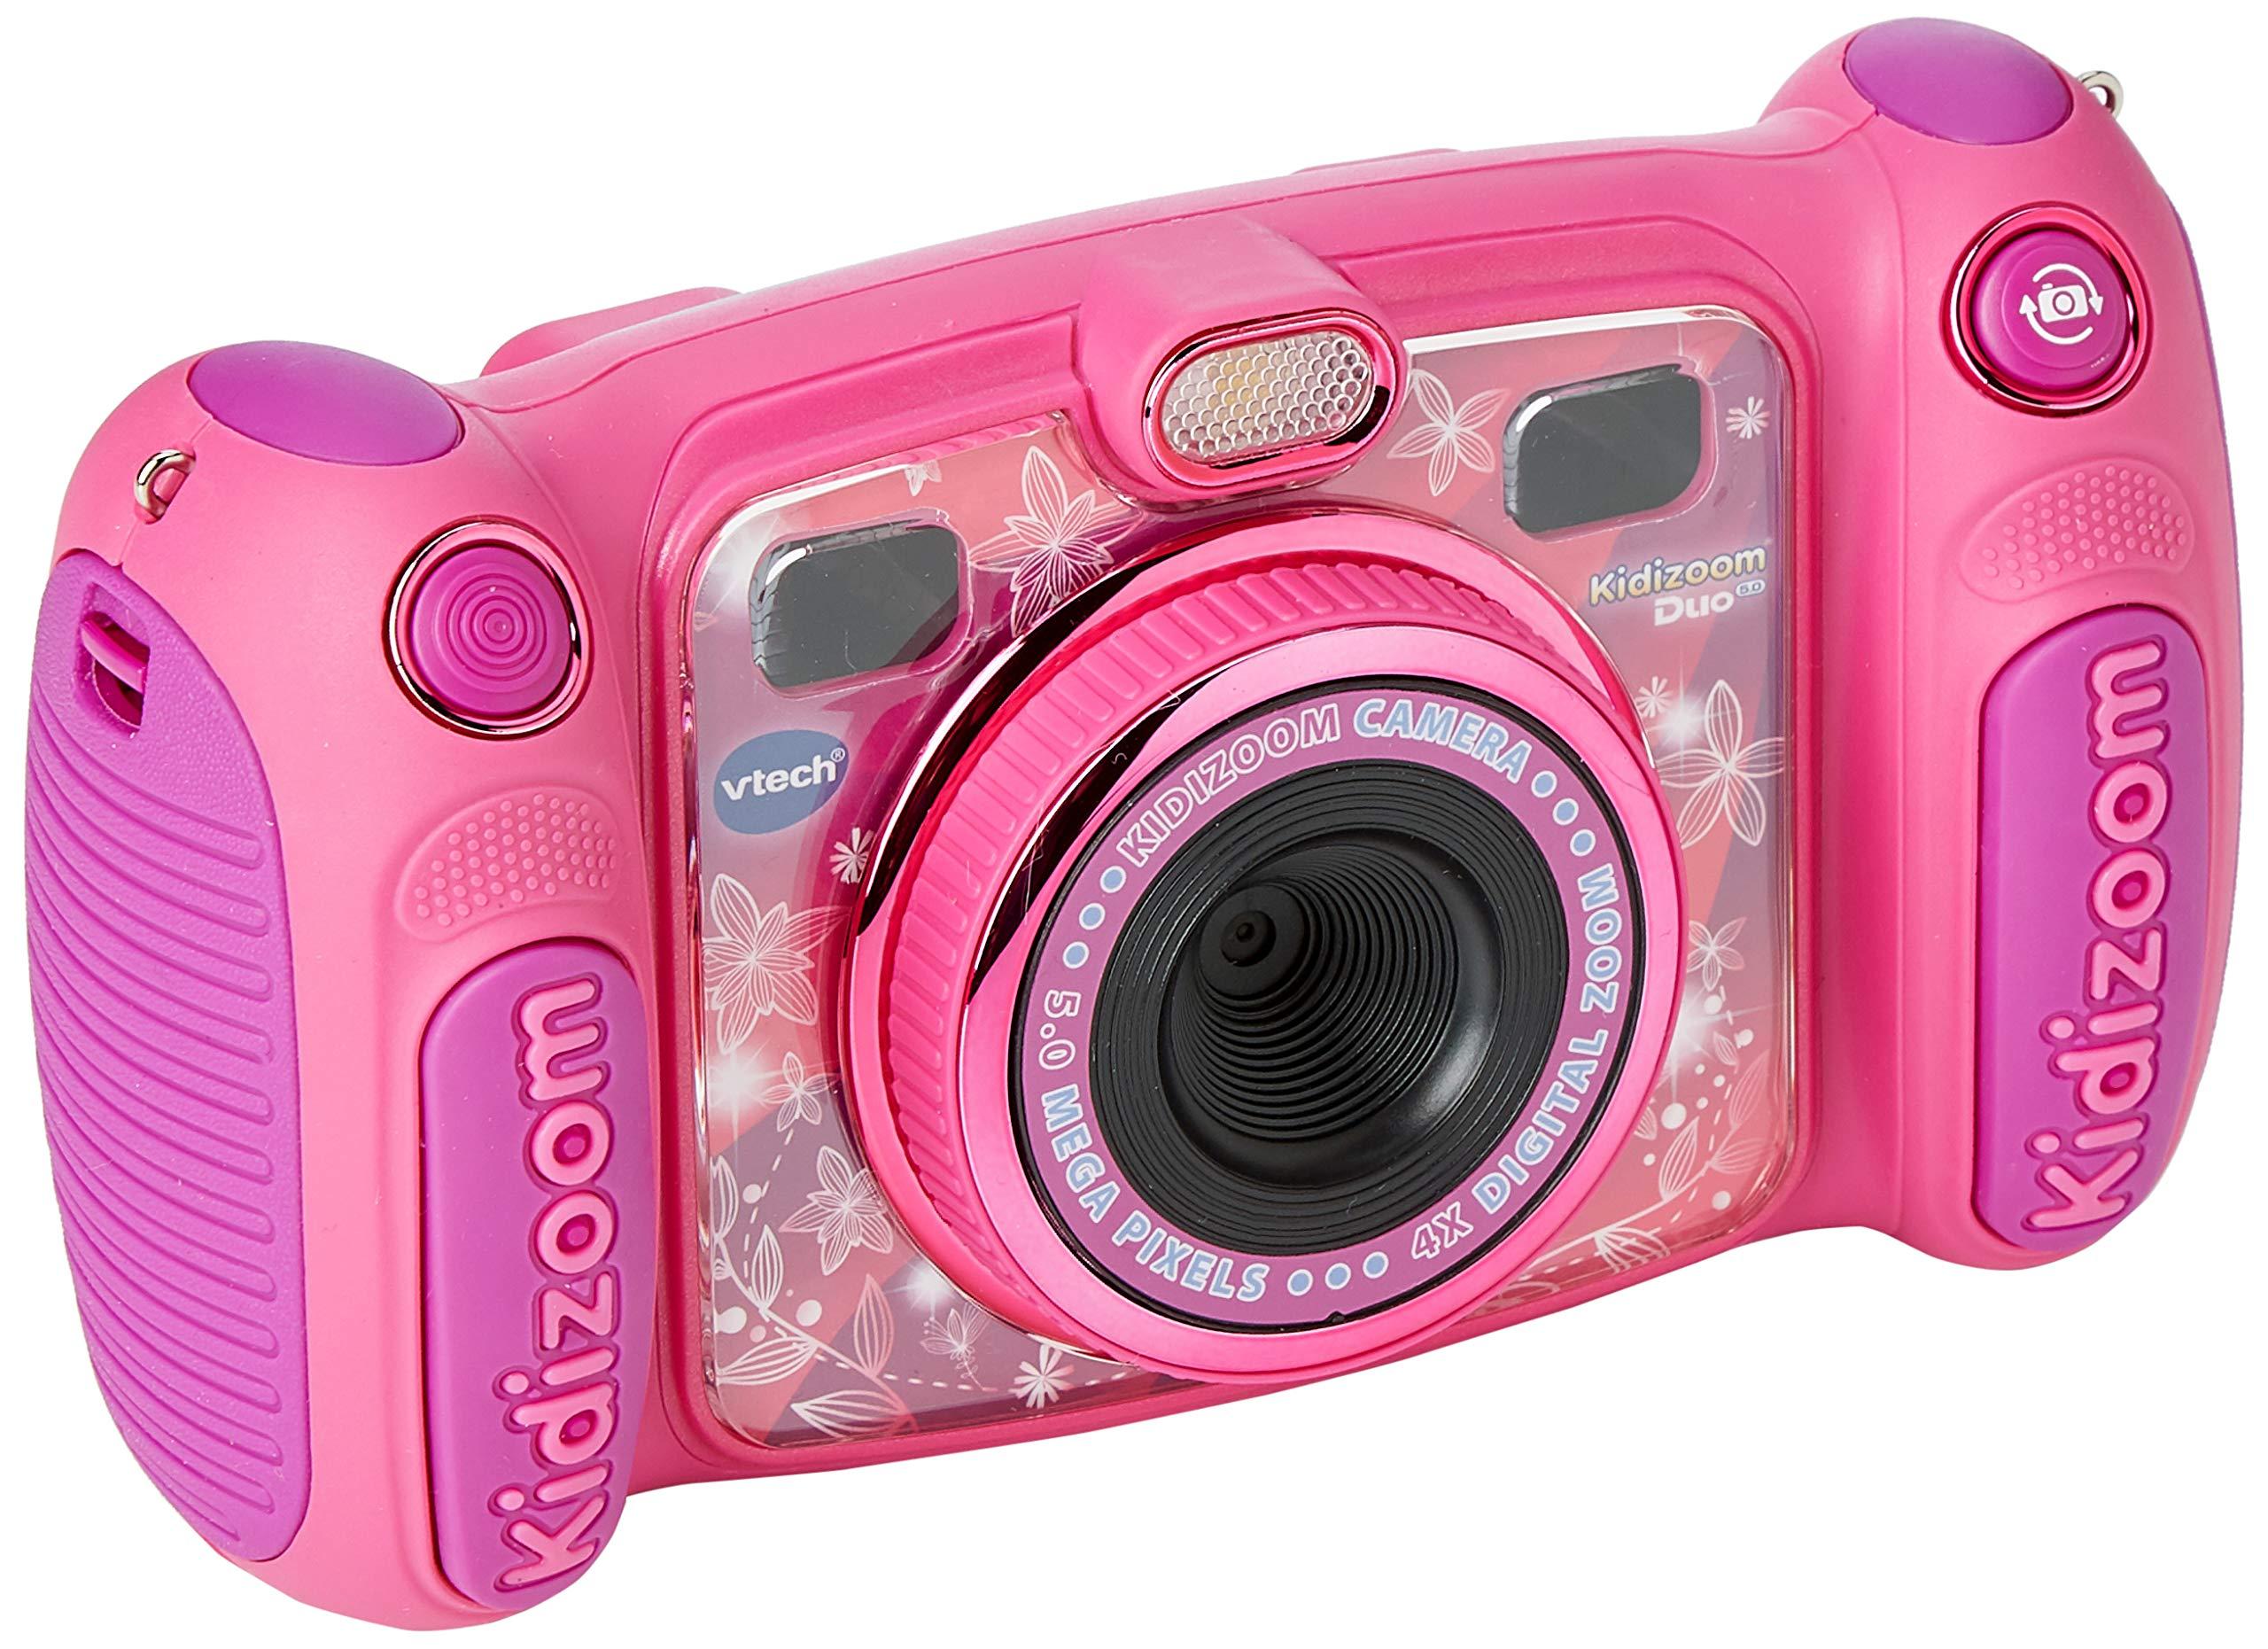 VTech Kidizoom Duo 5.0 Camera Pink by VTech (Image #1)